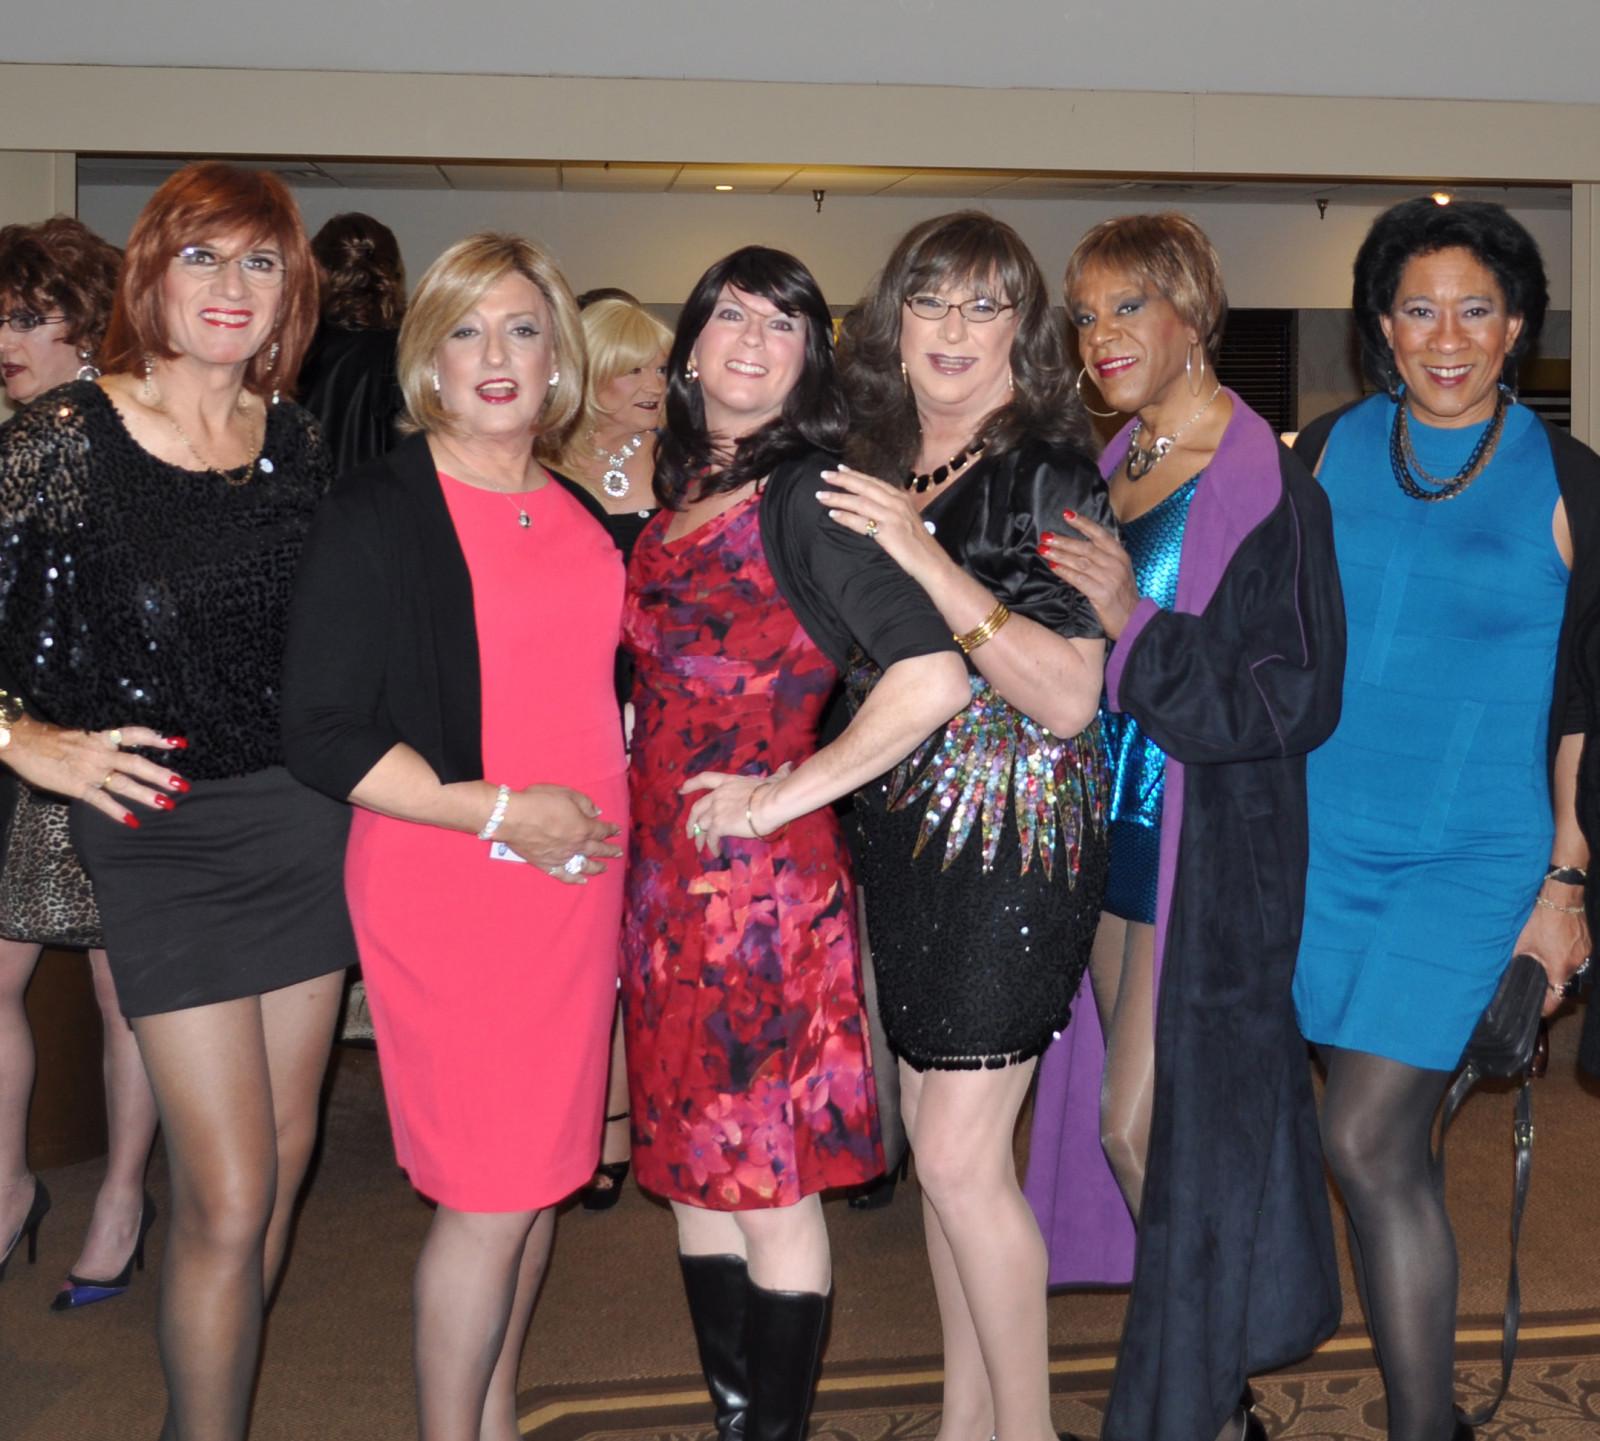 Beauty Fashion Group: Wallpaper : Minidress, Dress, Pantyhose, Friendship